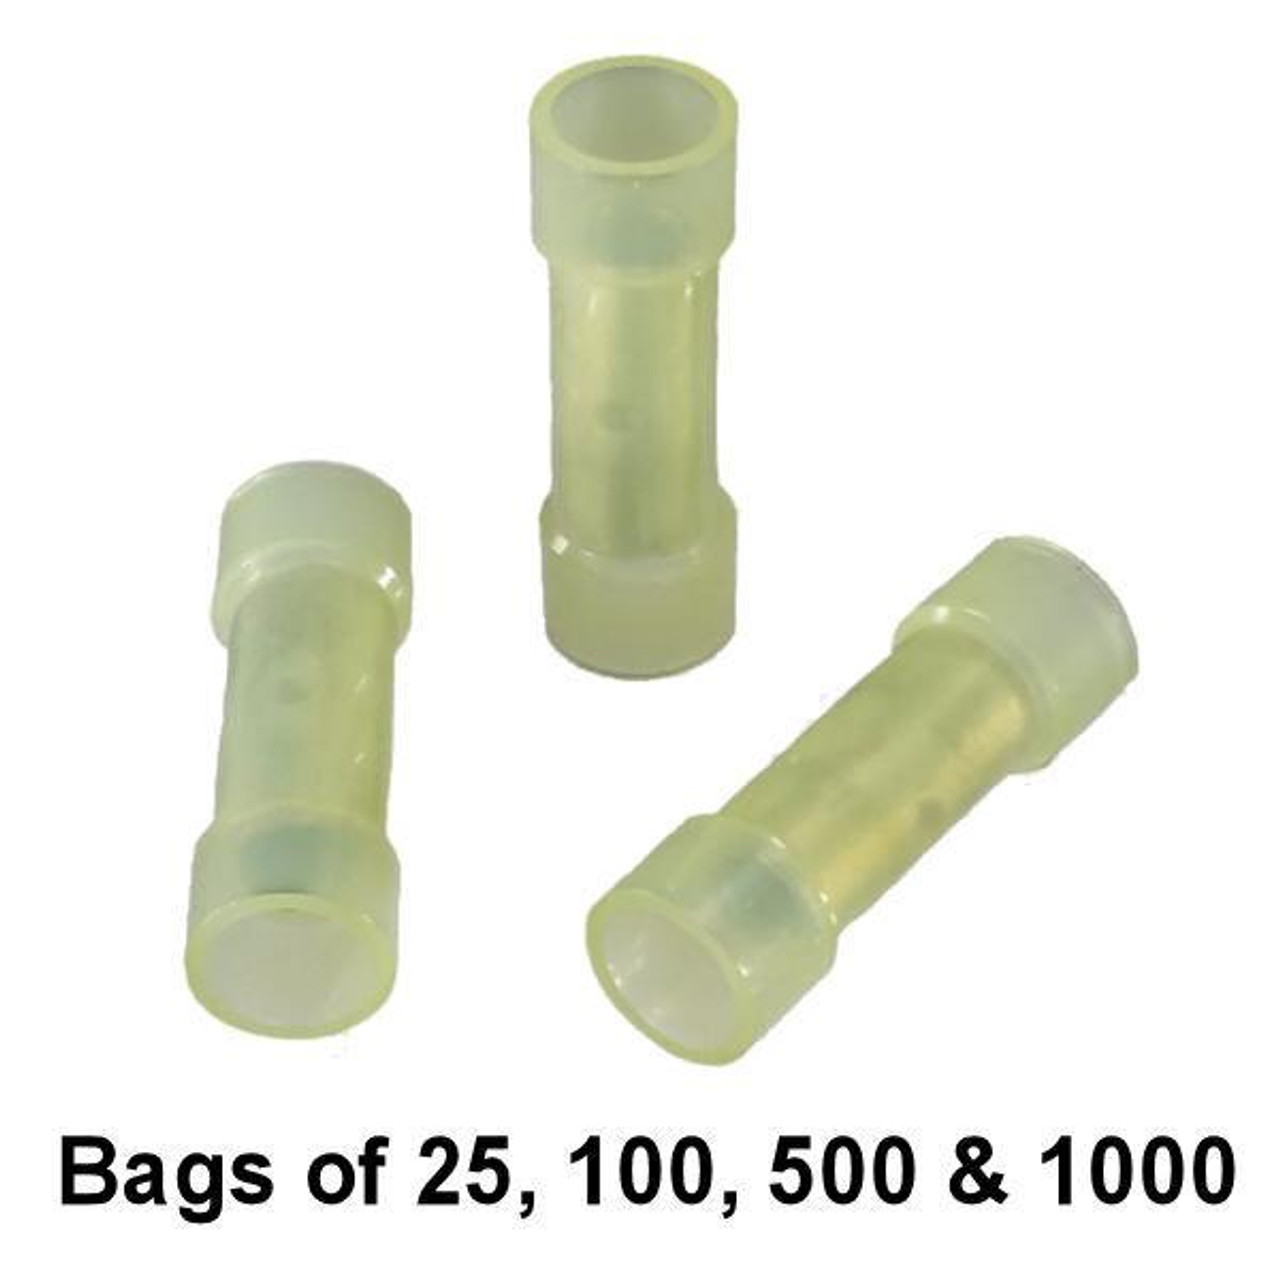 Yellow Nylon Butt Connector - Bulk / Wholesale